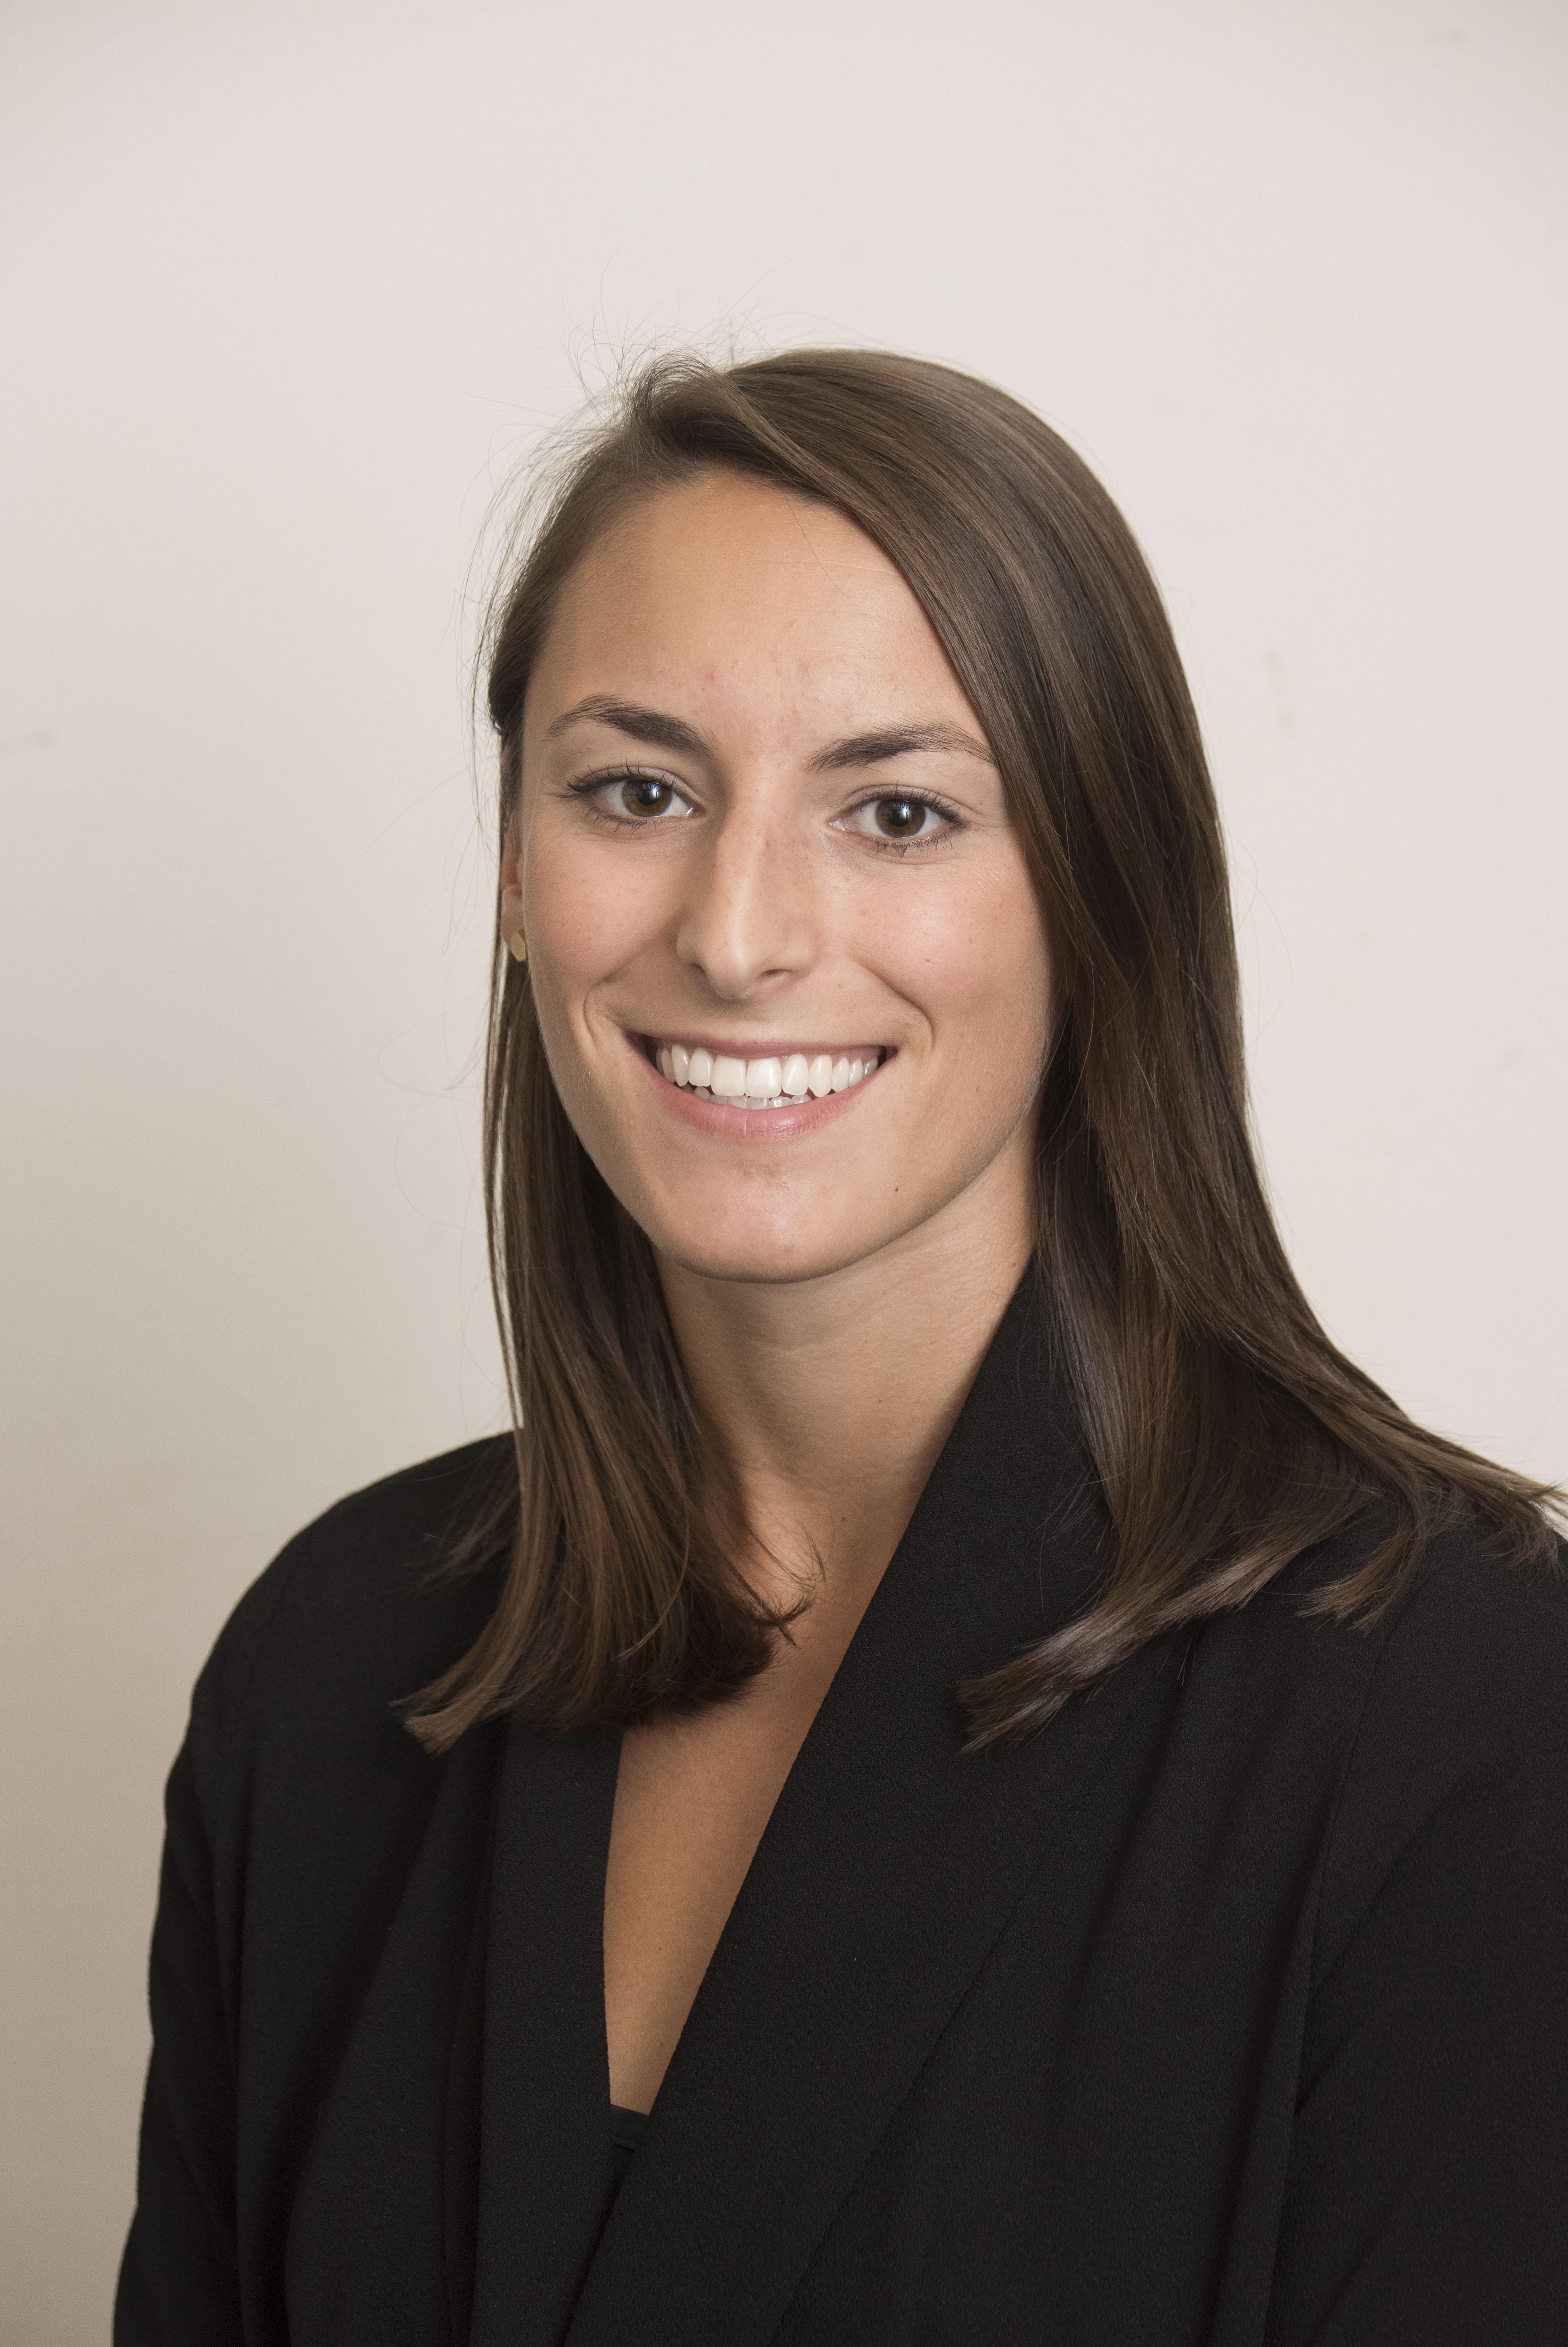 Headshot of Sarah Schoengold